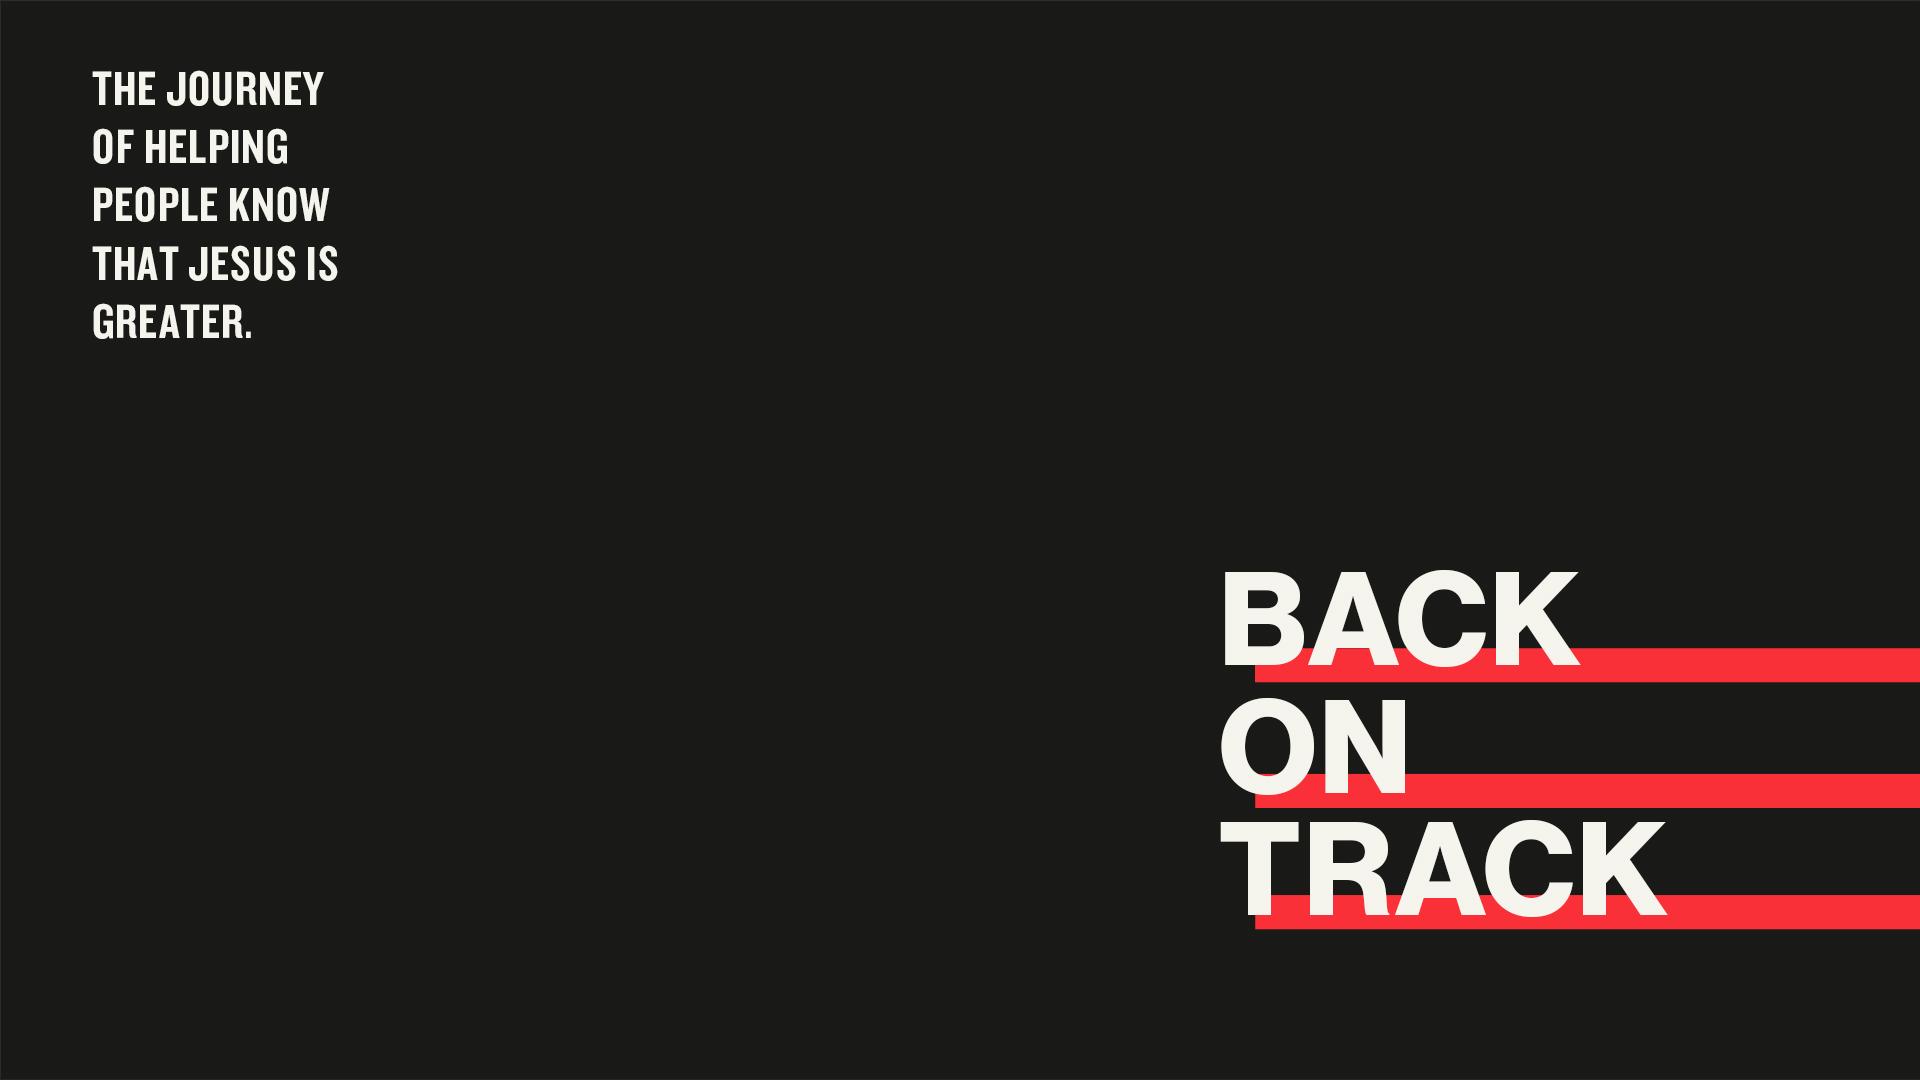 Back on Track 16x9.jpg